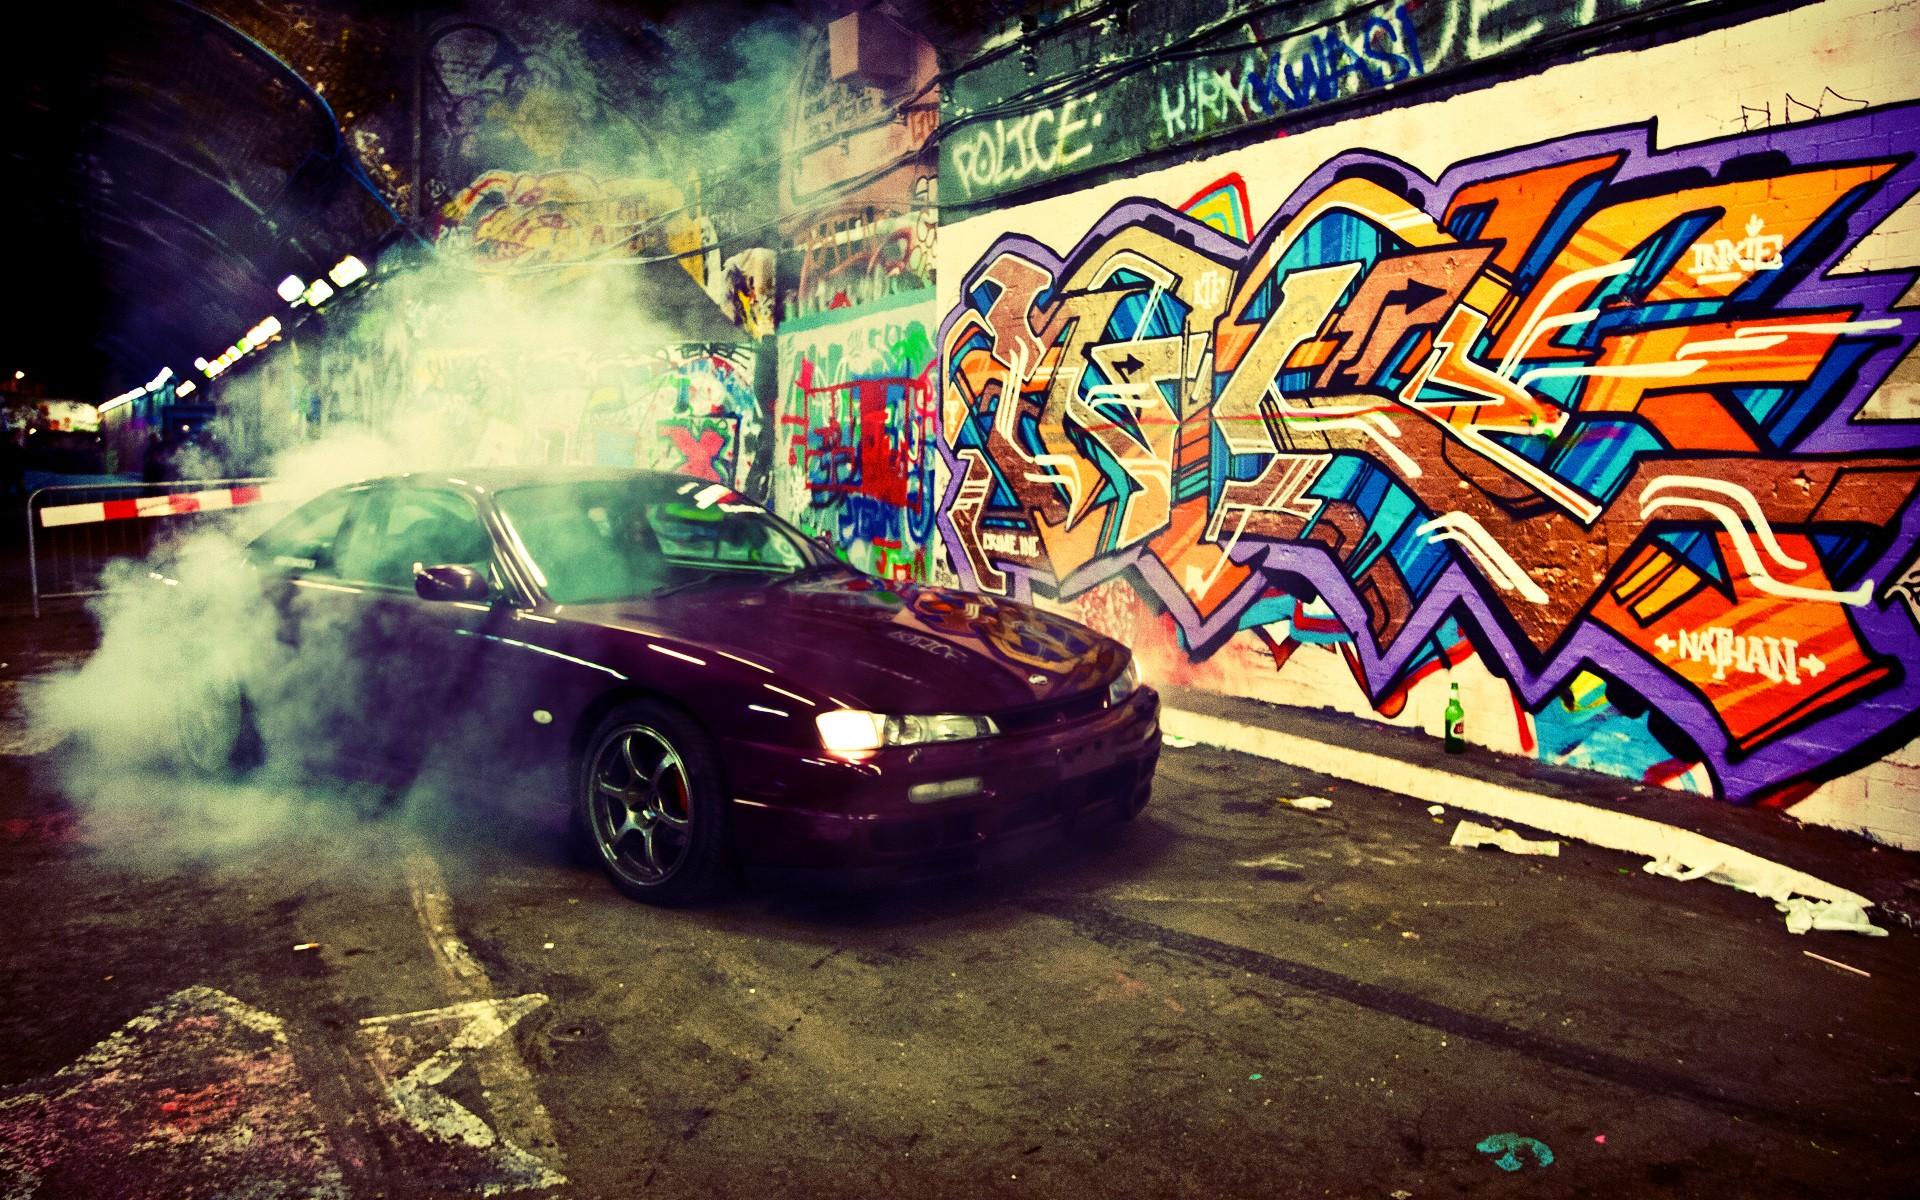 Hd Graffiti Wallpaper - WallpaperSafari